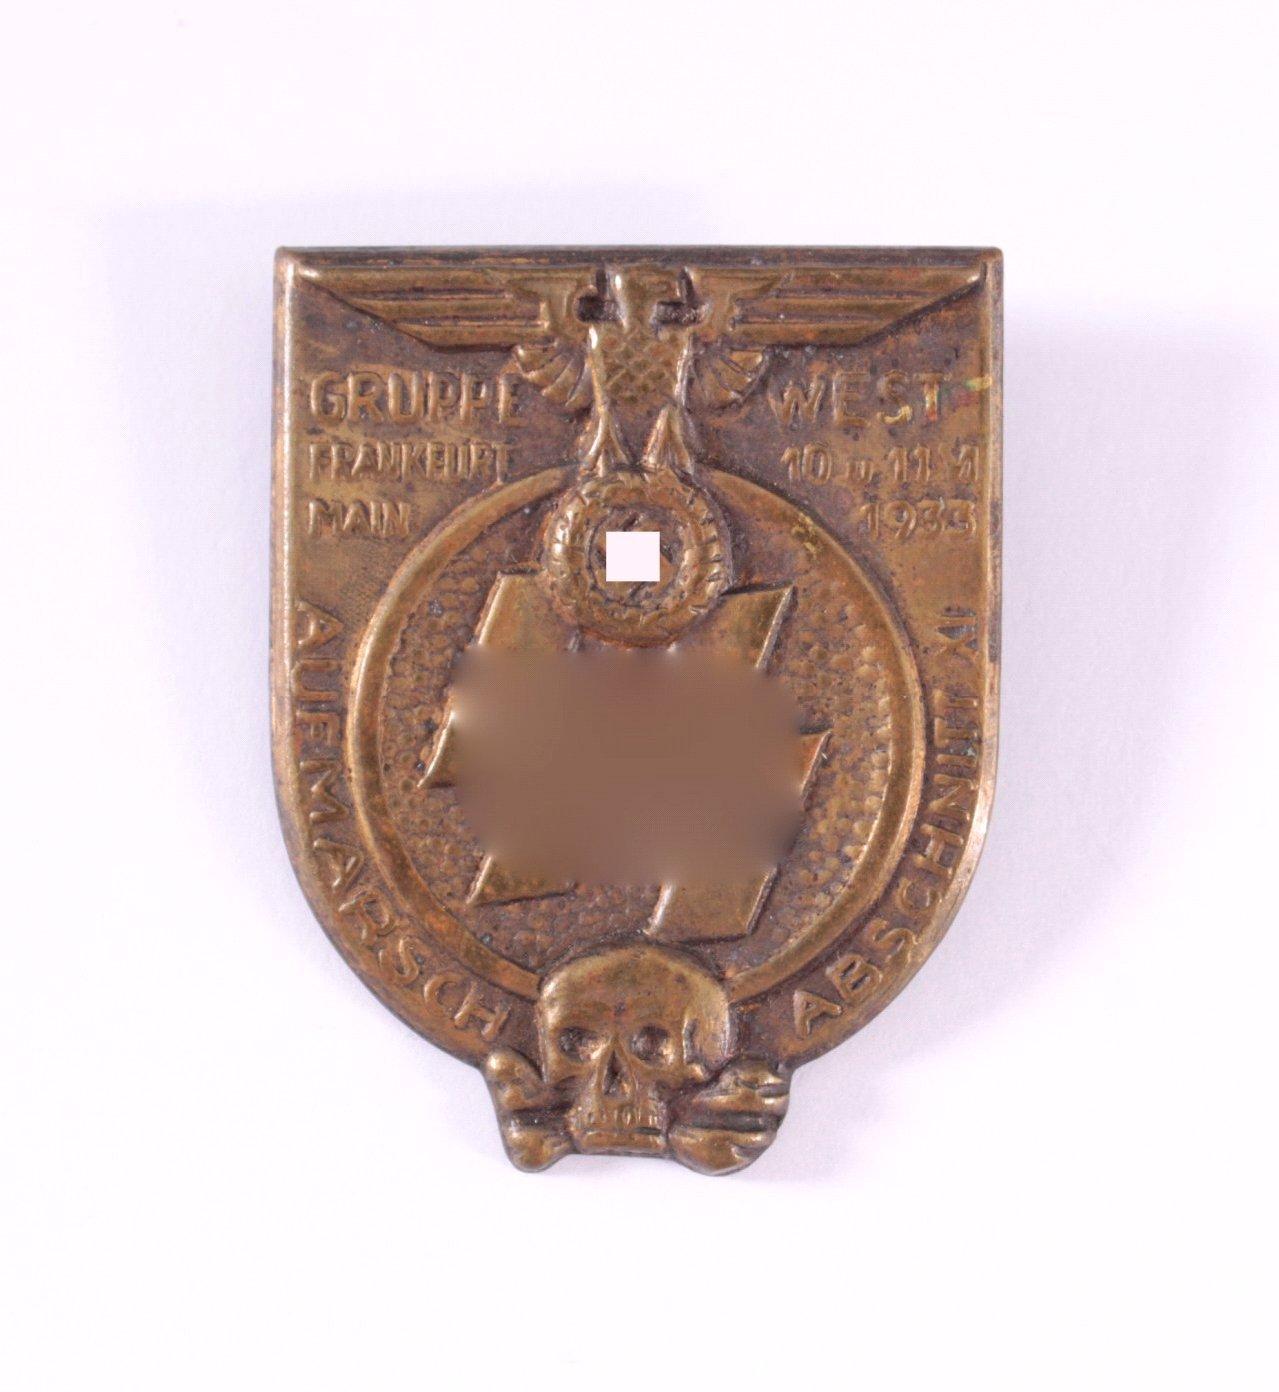 Abzeichen SS Aufmarsch Abschnitt XI, Gruppe West 1933